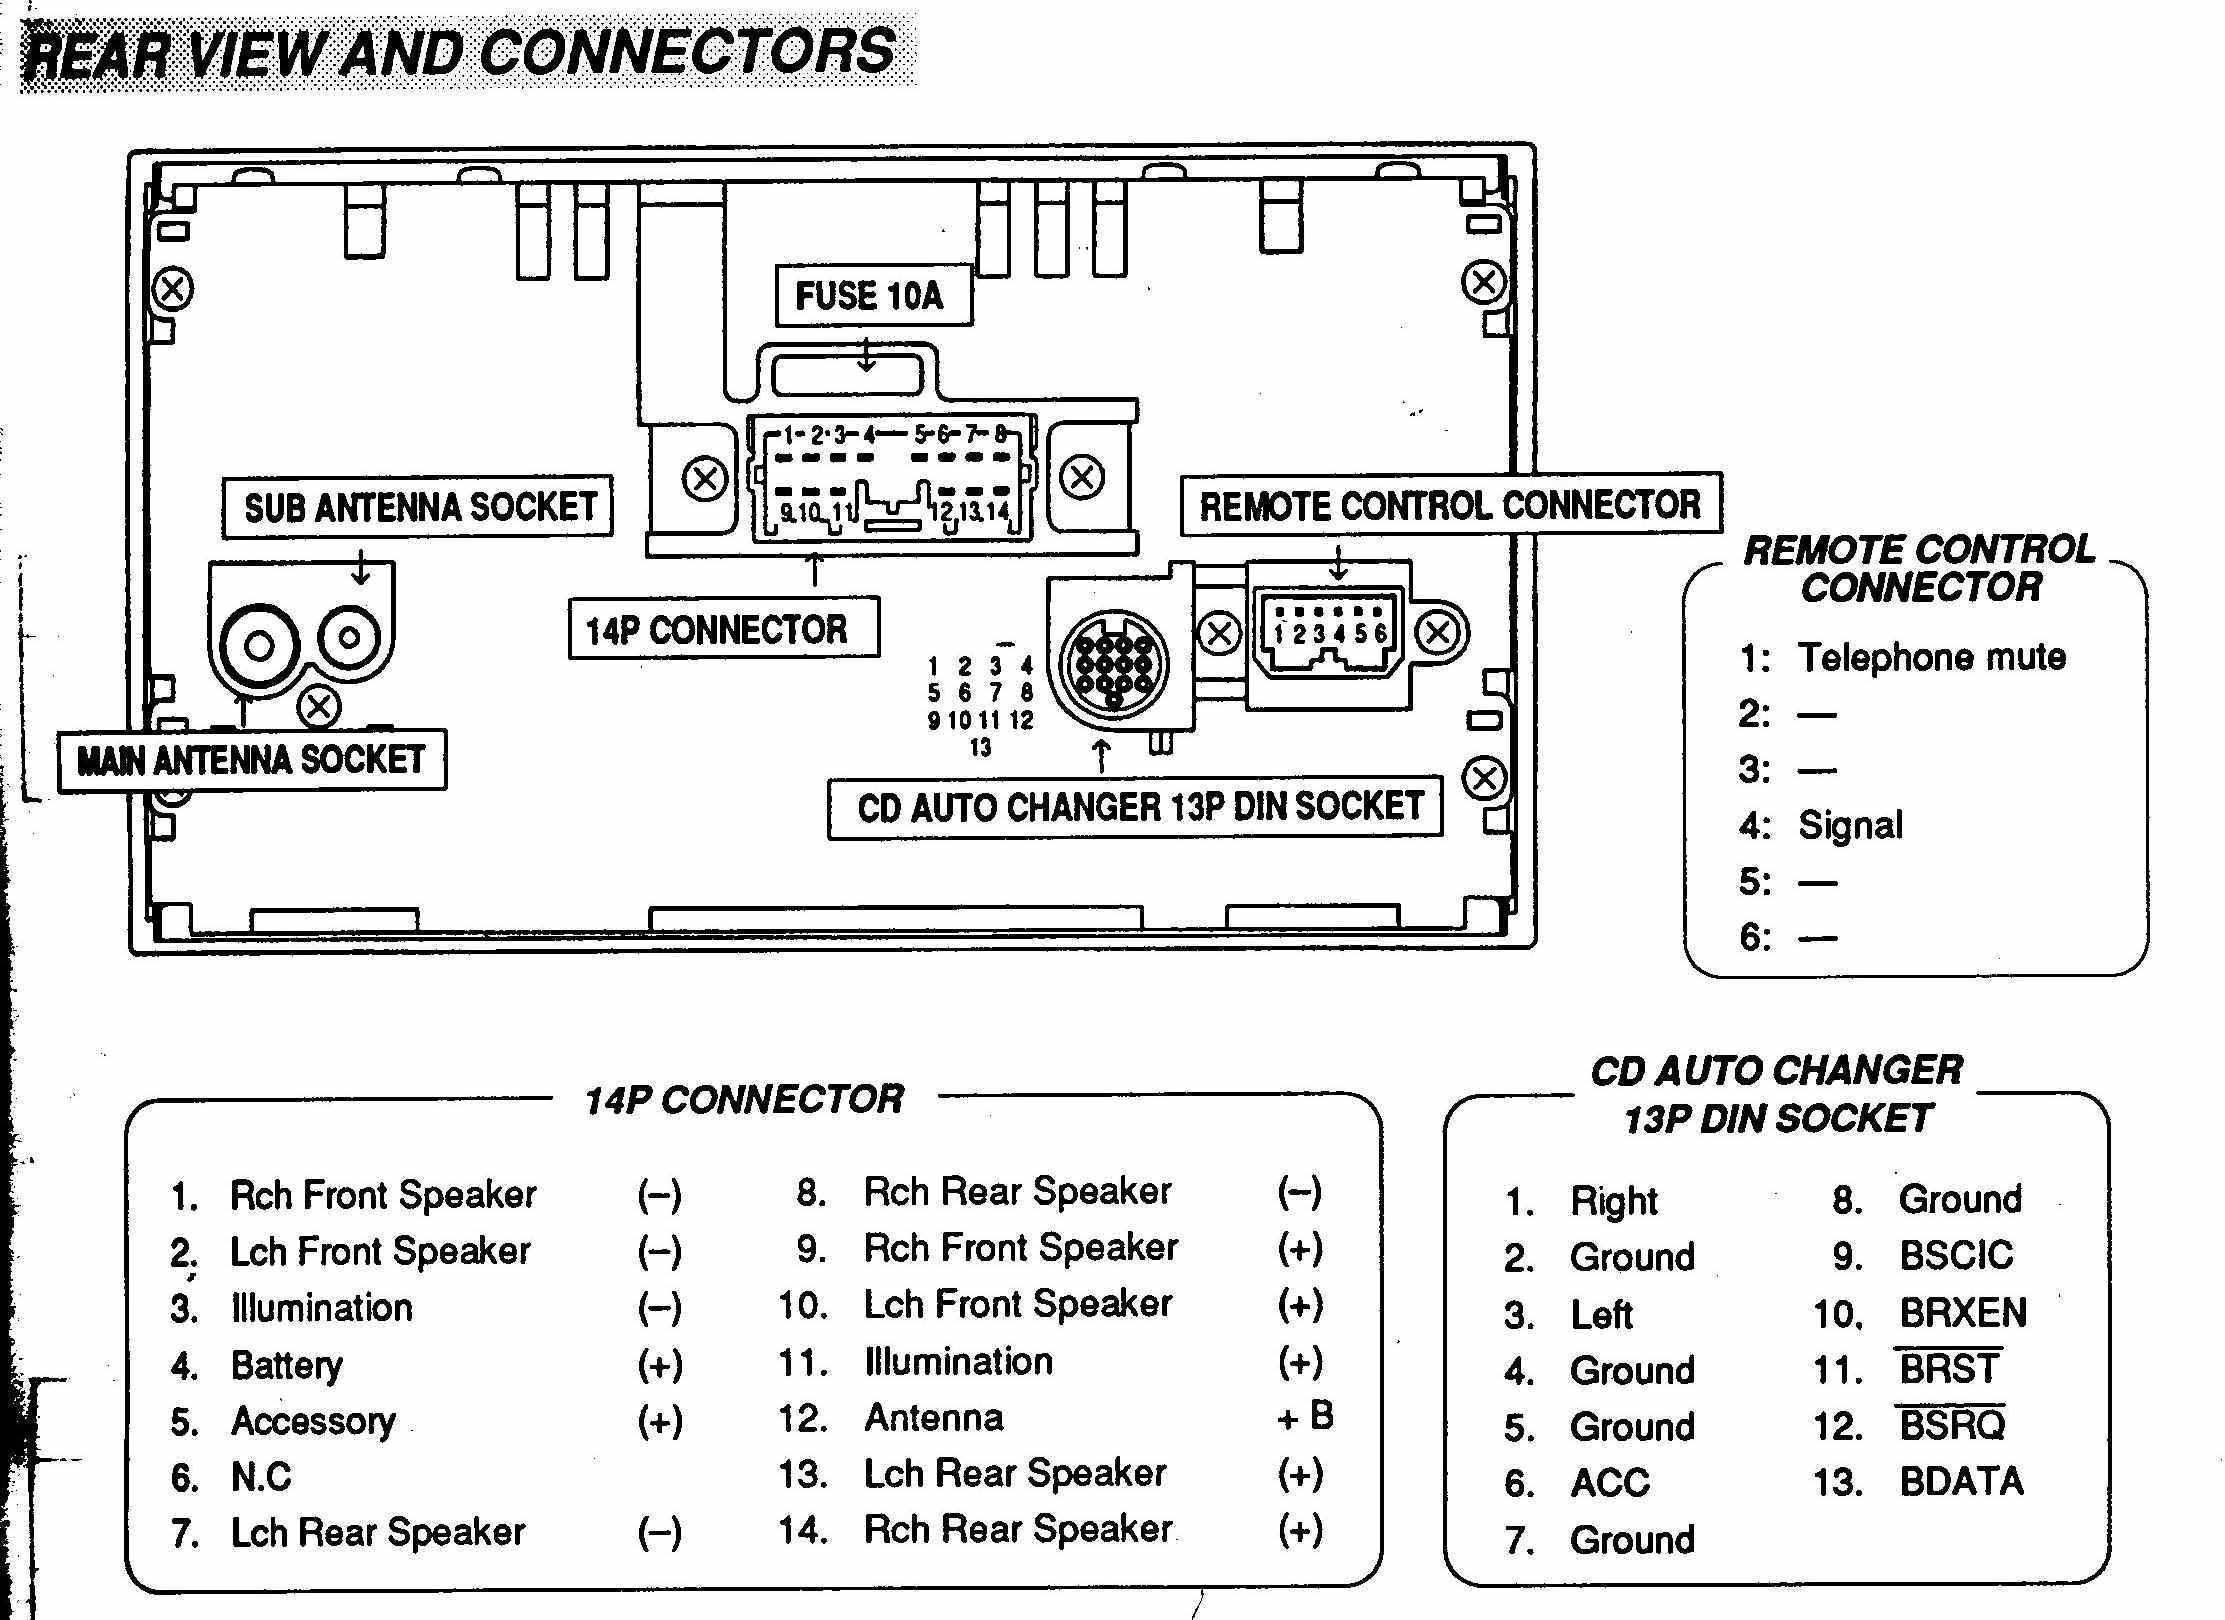 Toyota Radio Wiring Diagram Wiring Diagram Moreover 2001 Mitsubishi Eclipse Radio Wiring Diagram Of Toyota Radio Wiring Diagram